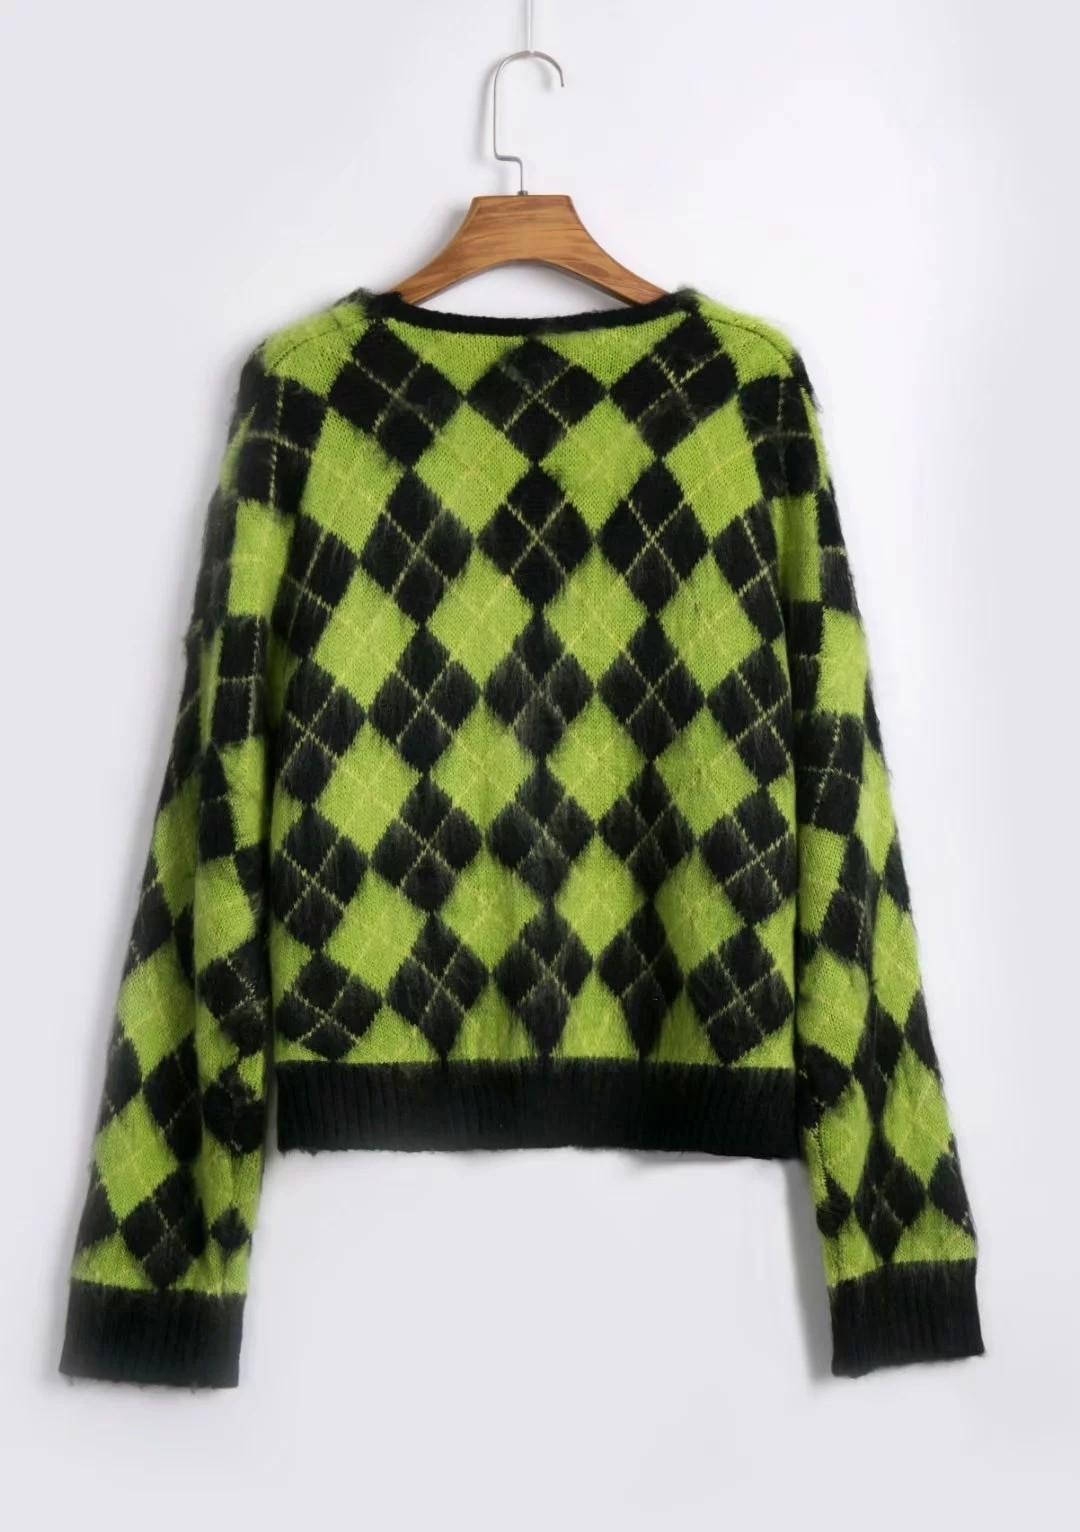 Punk Vintage knitted oversized cardigan 42